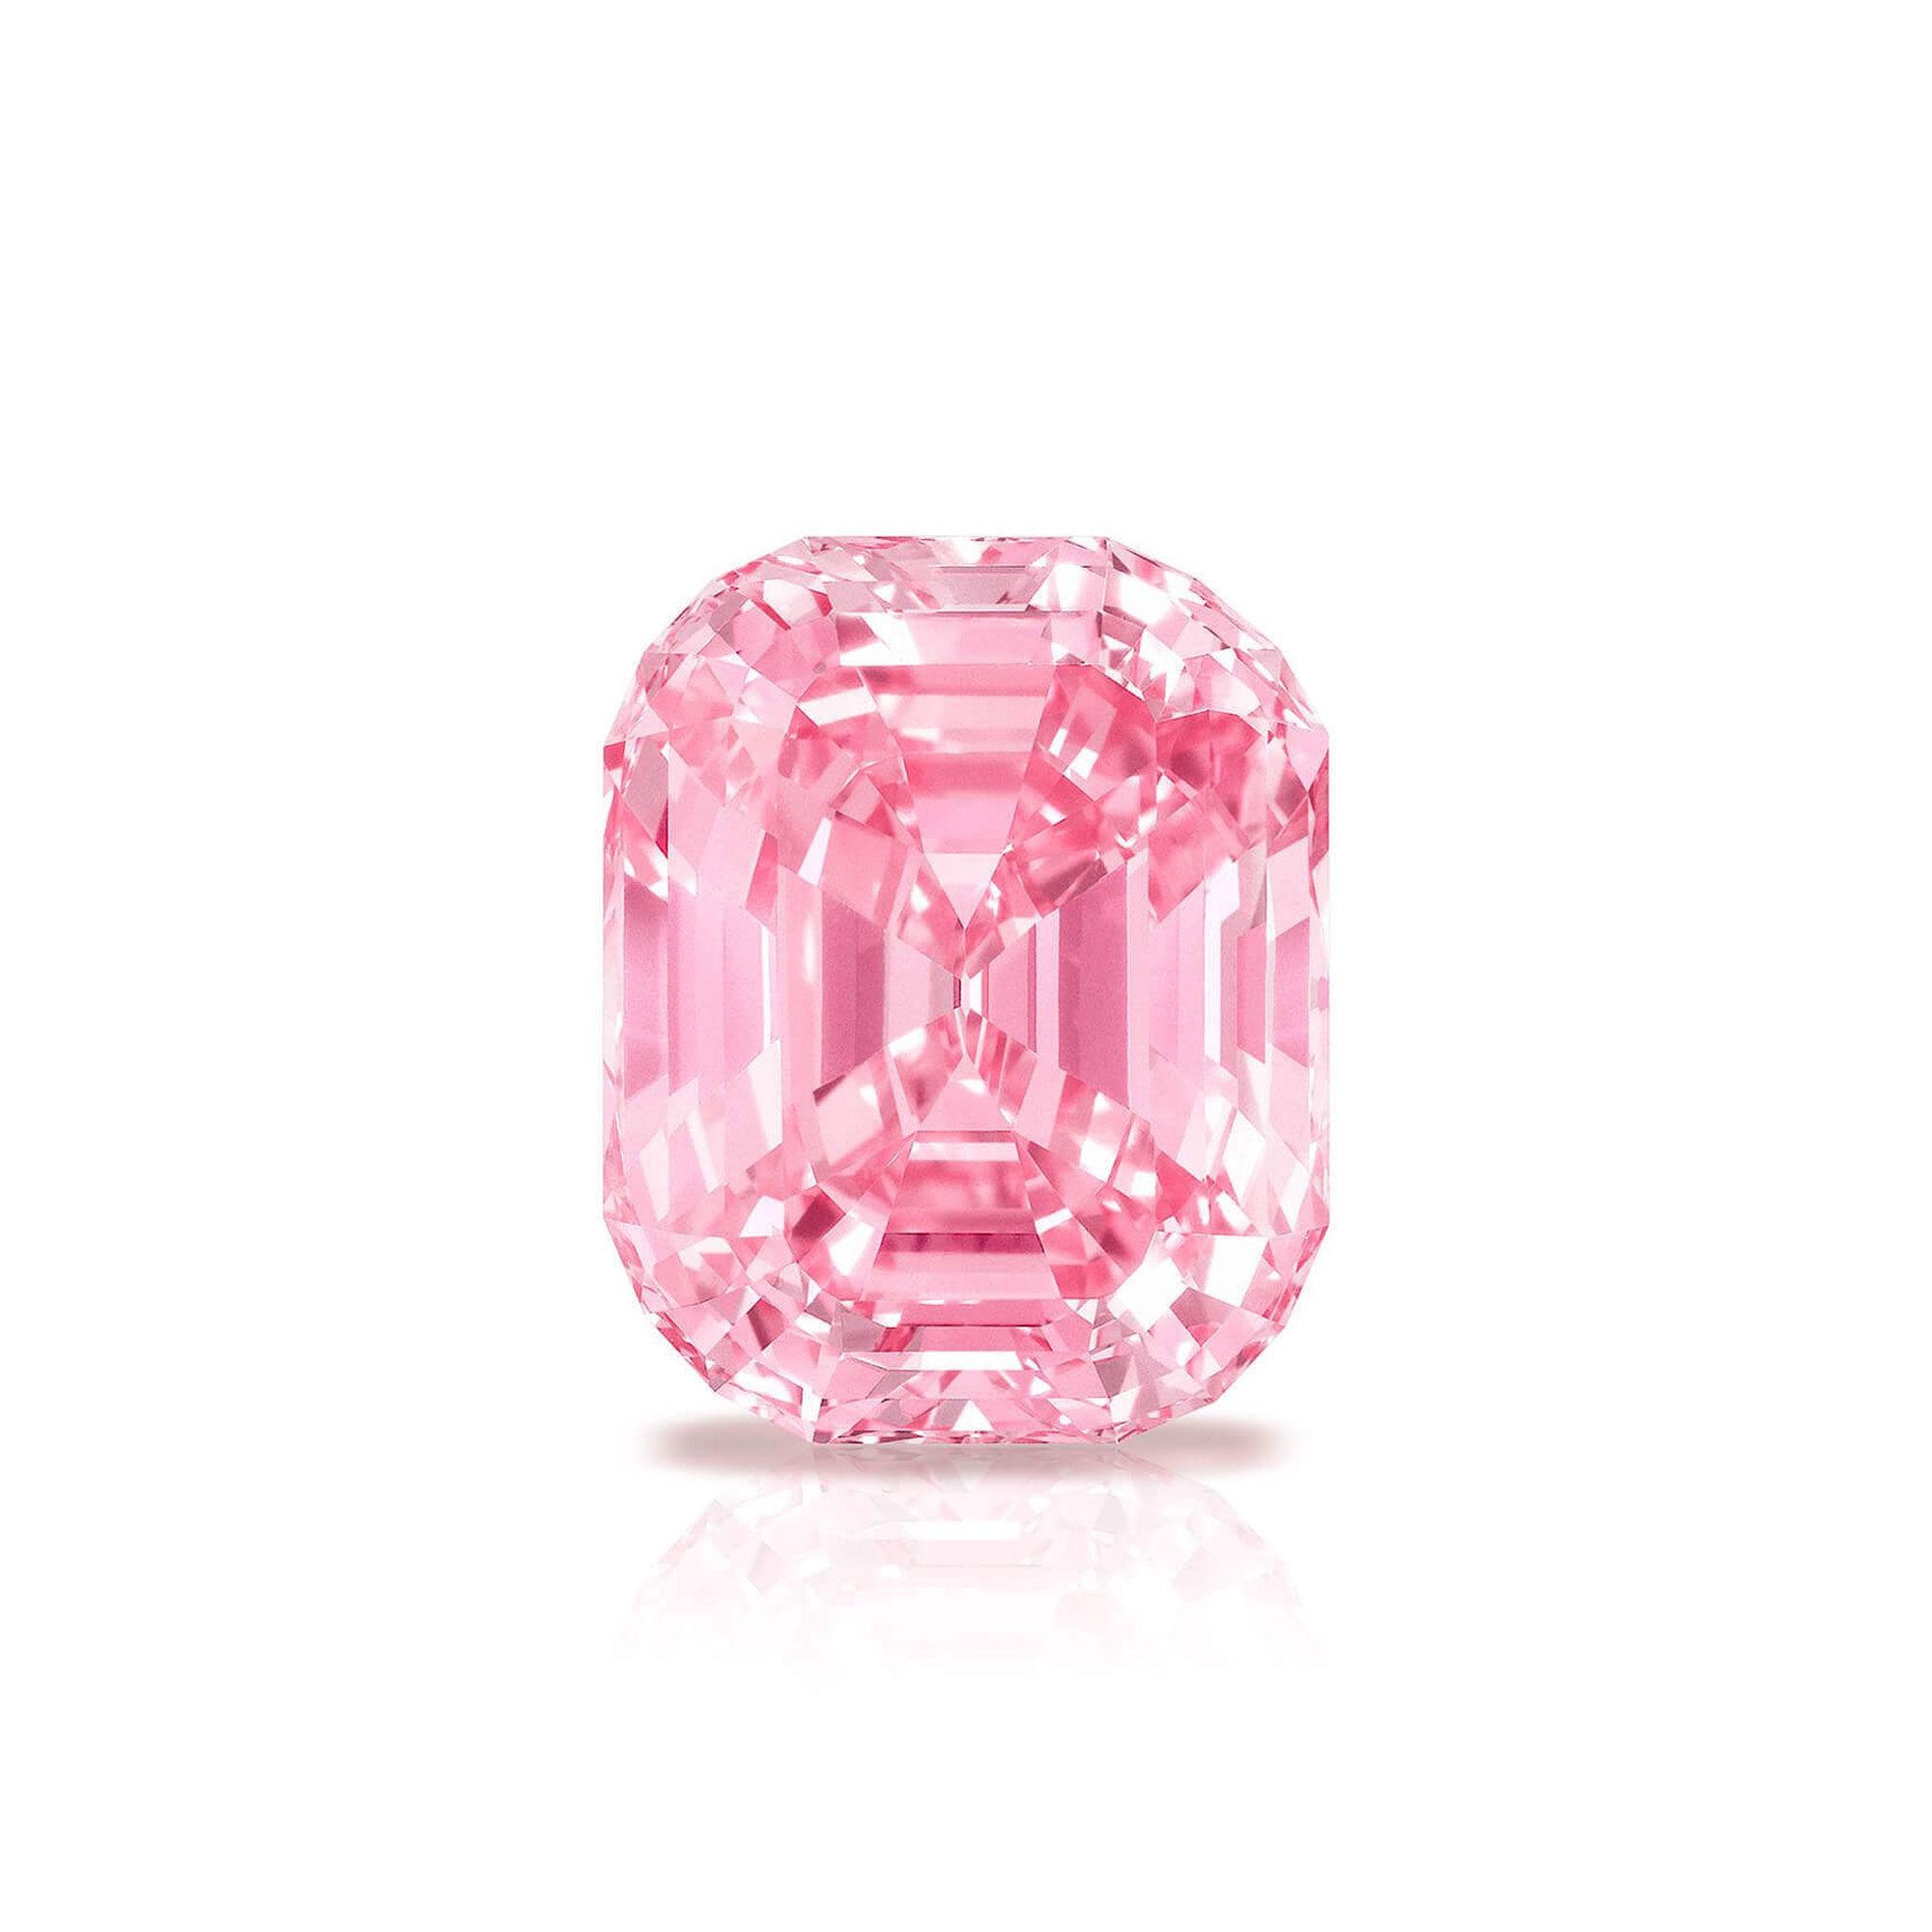 The Graff Pink famous pink diamond